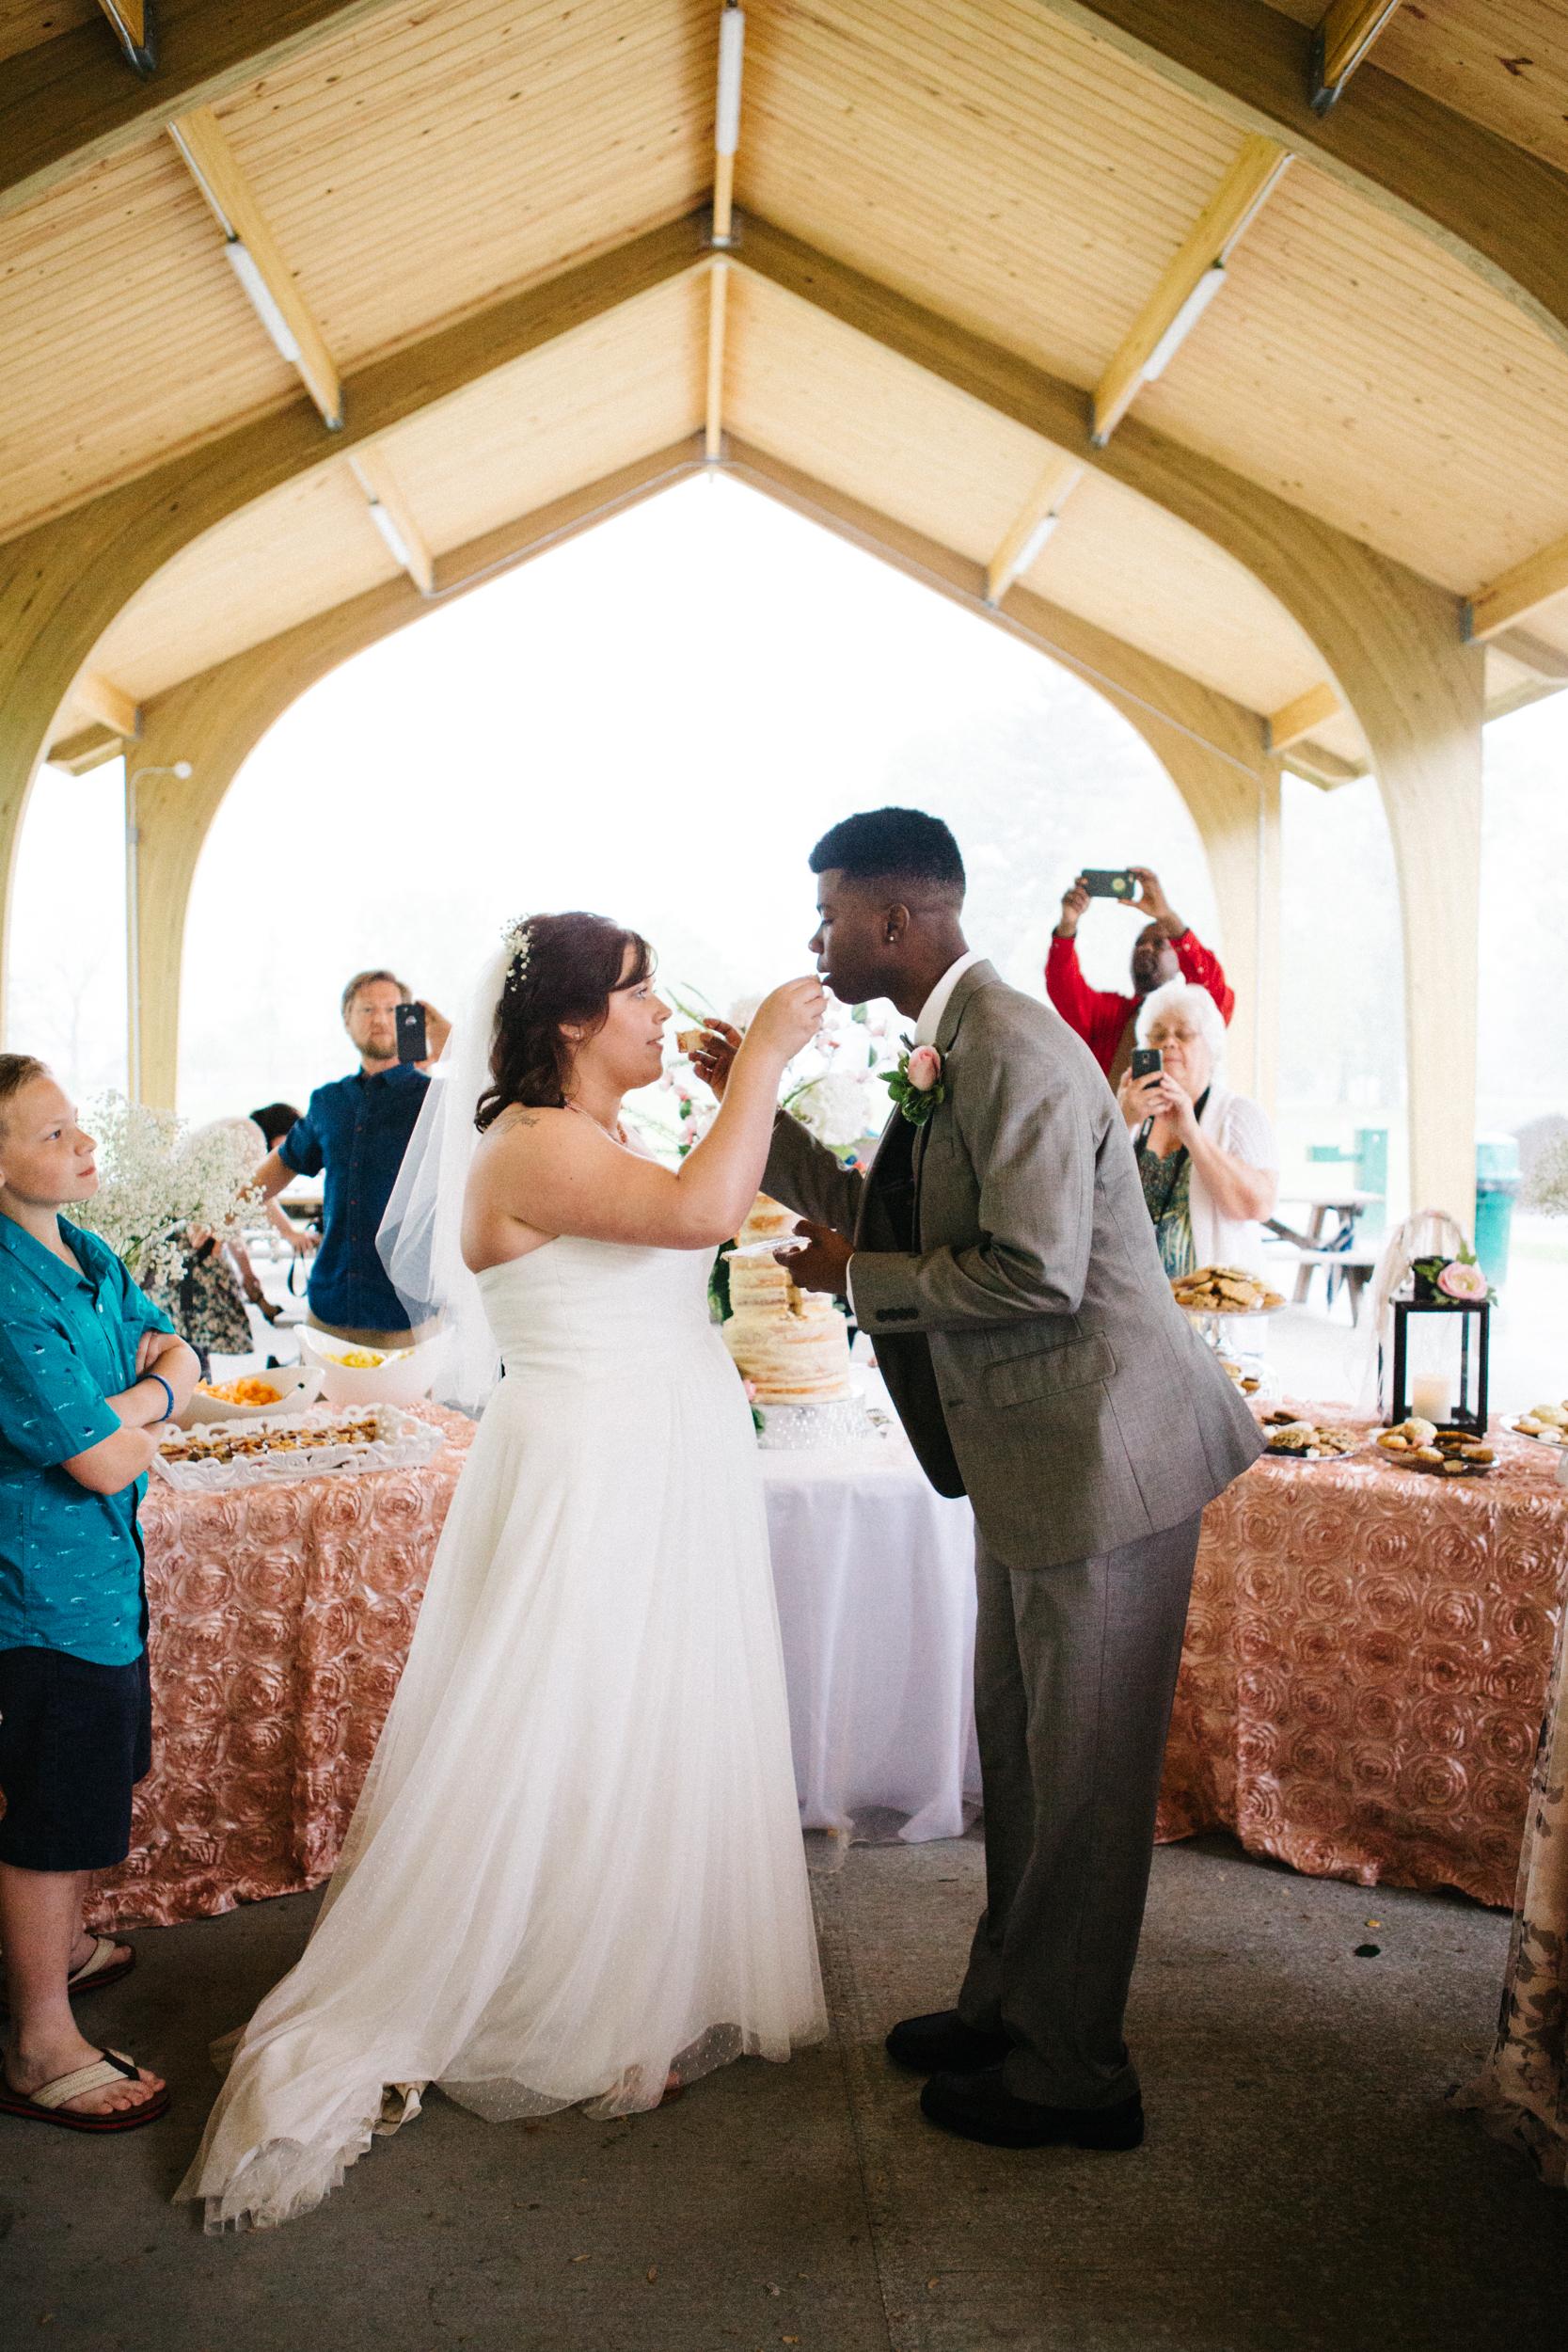 Picnic Wedding Cake Cutting